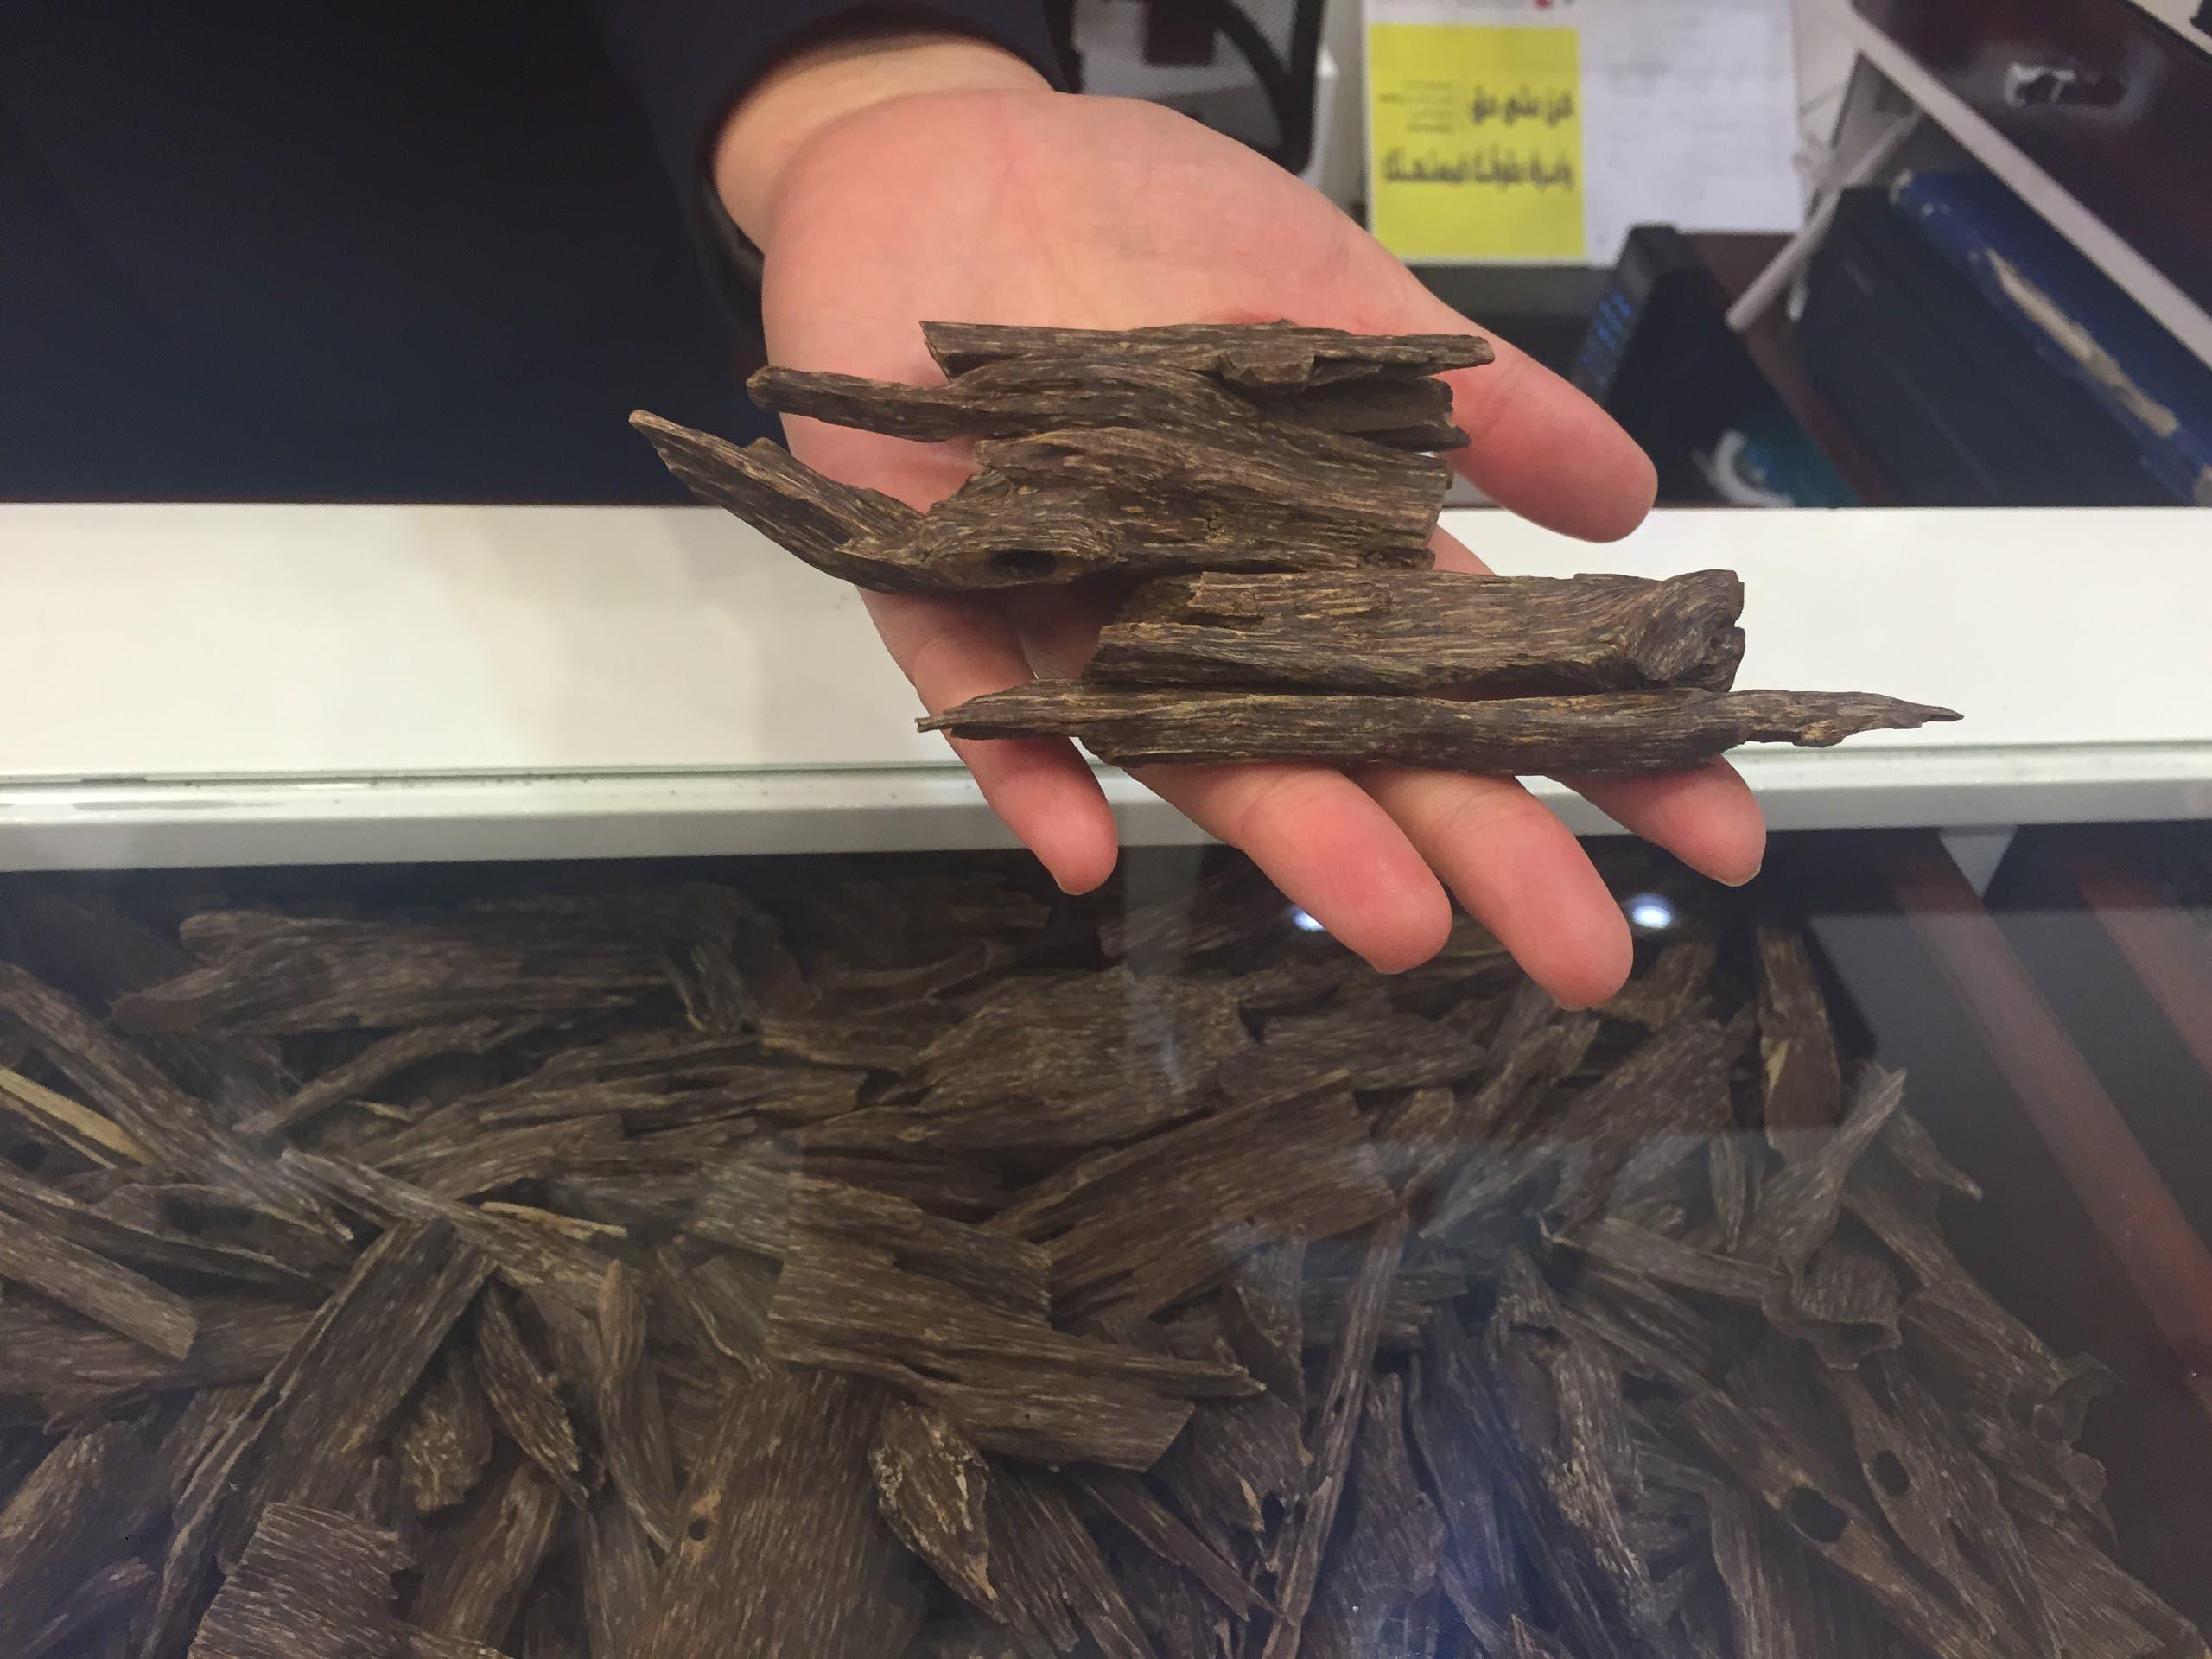 A tola, or 12 grams, of cambodian oud is shown. Usually emits softer notes. (Ismaeel Naar/Al Arabiya English)